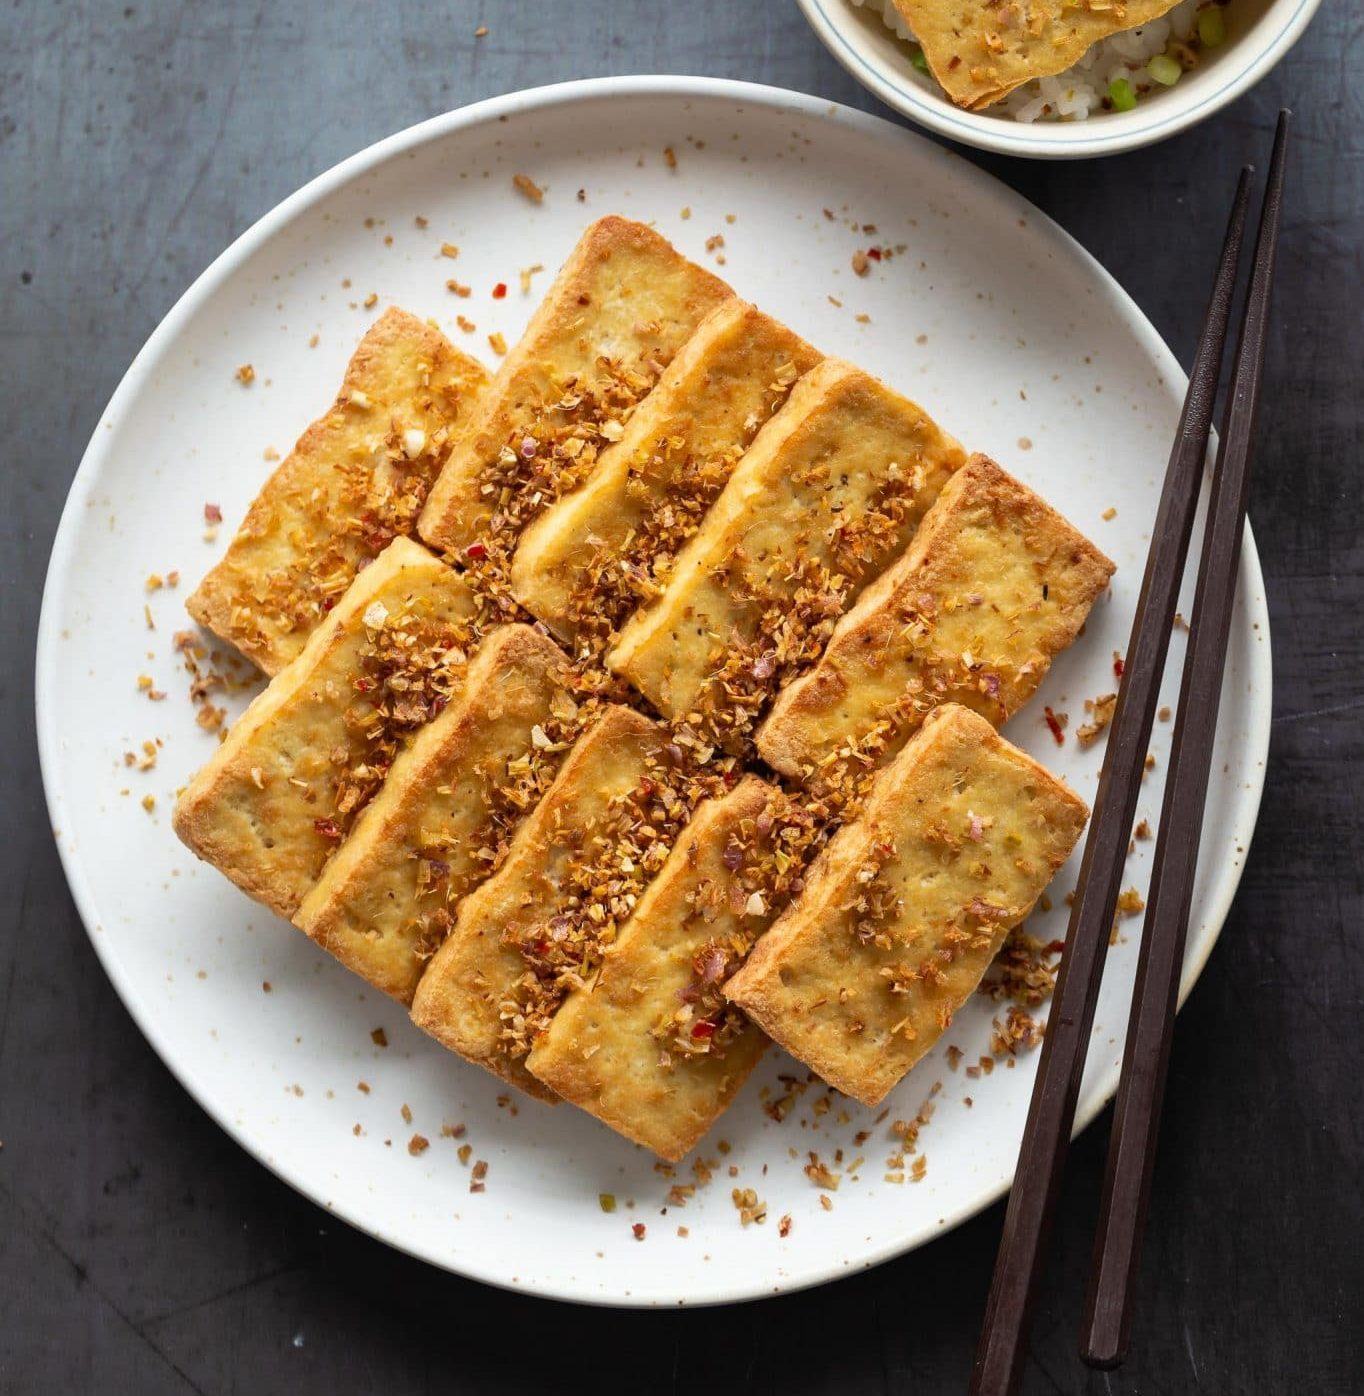 Vietnamese-Lemongrass-Chili-Tofu-Dau-Hu-Chien-Sa-Ot-1-1365x2048